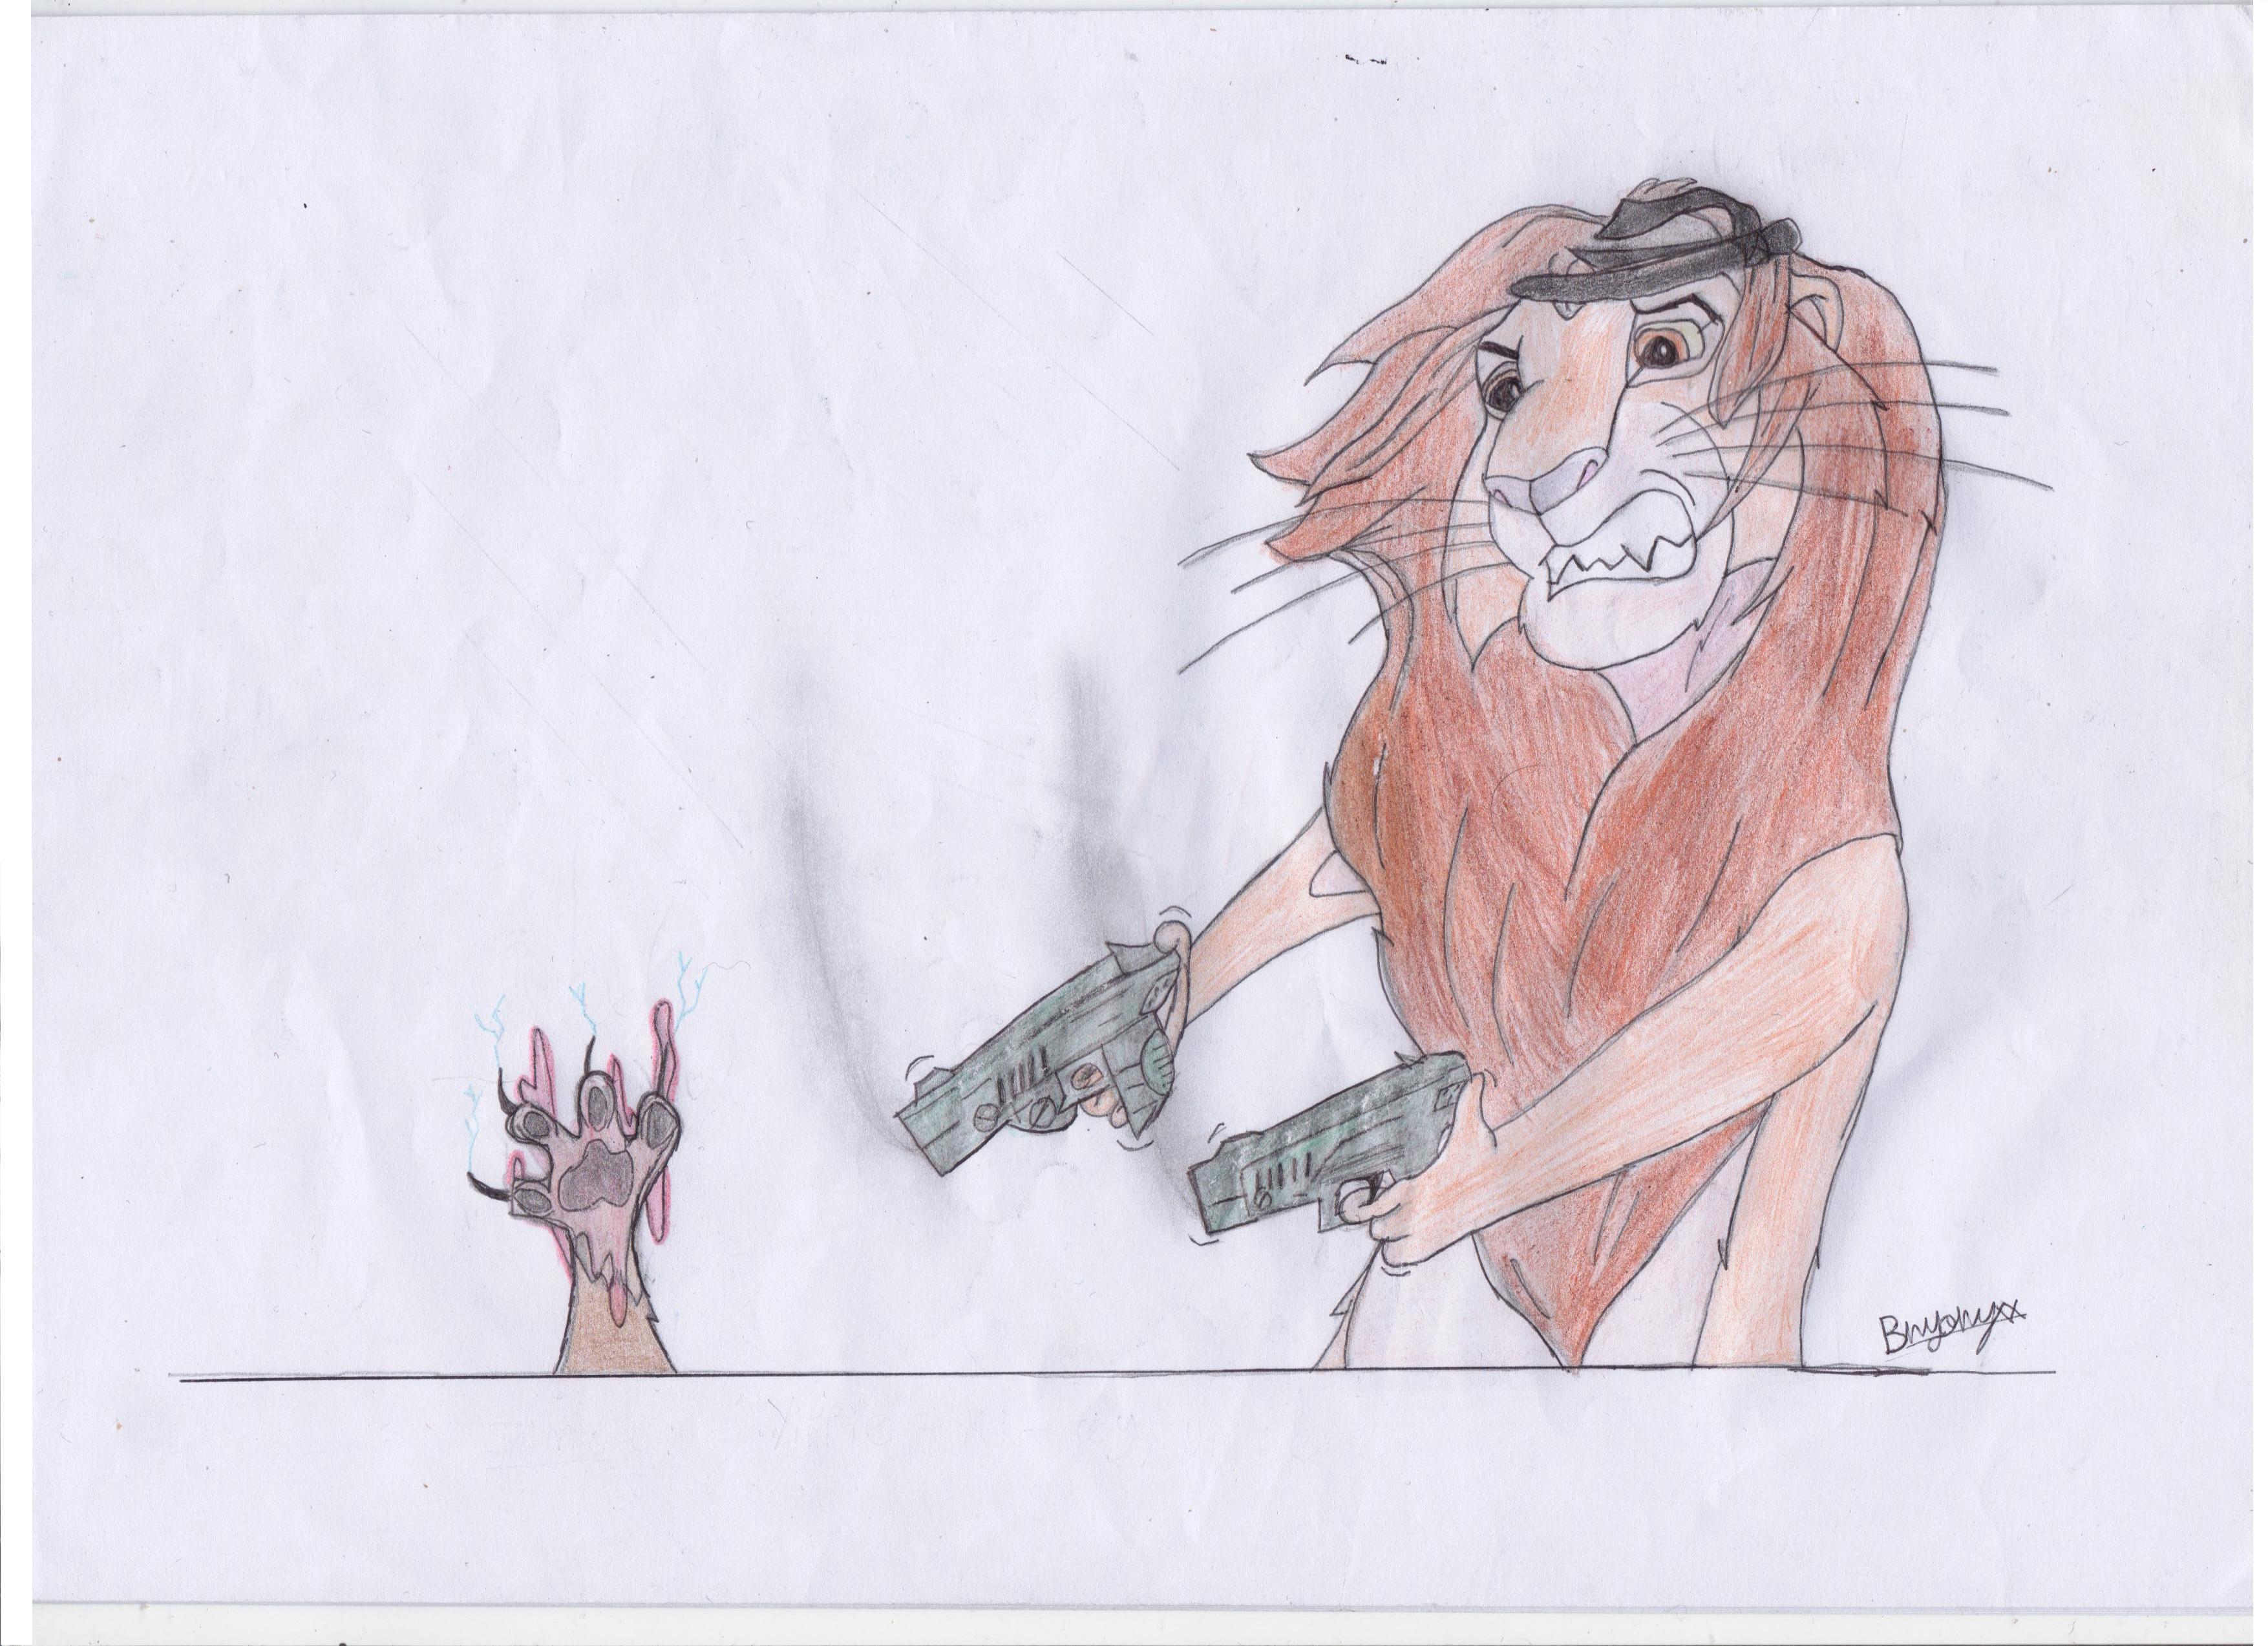 Die hard the lion king